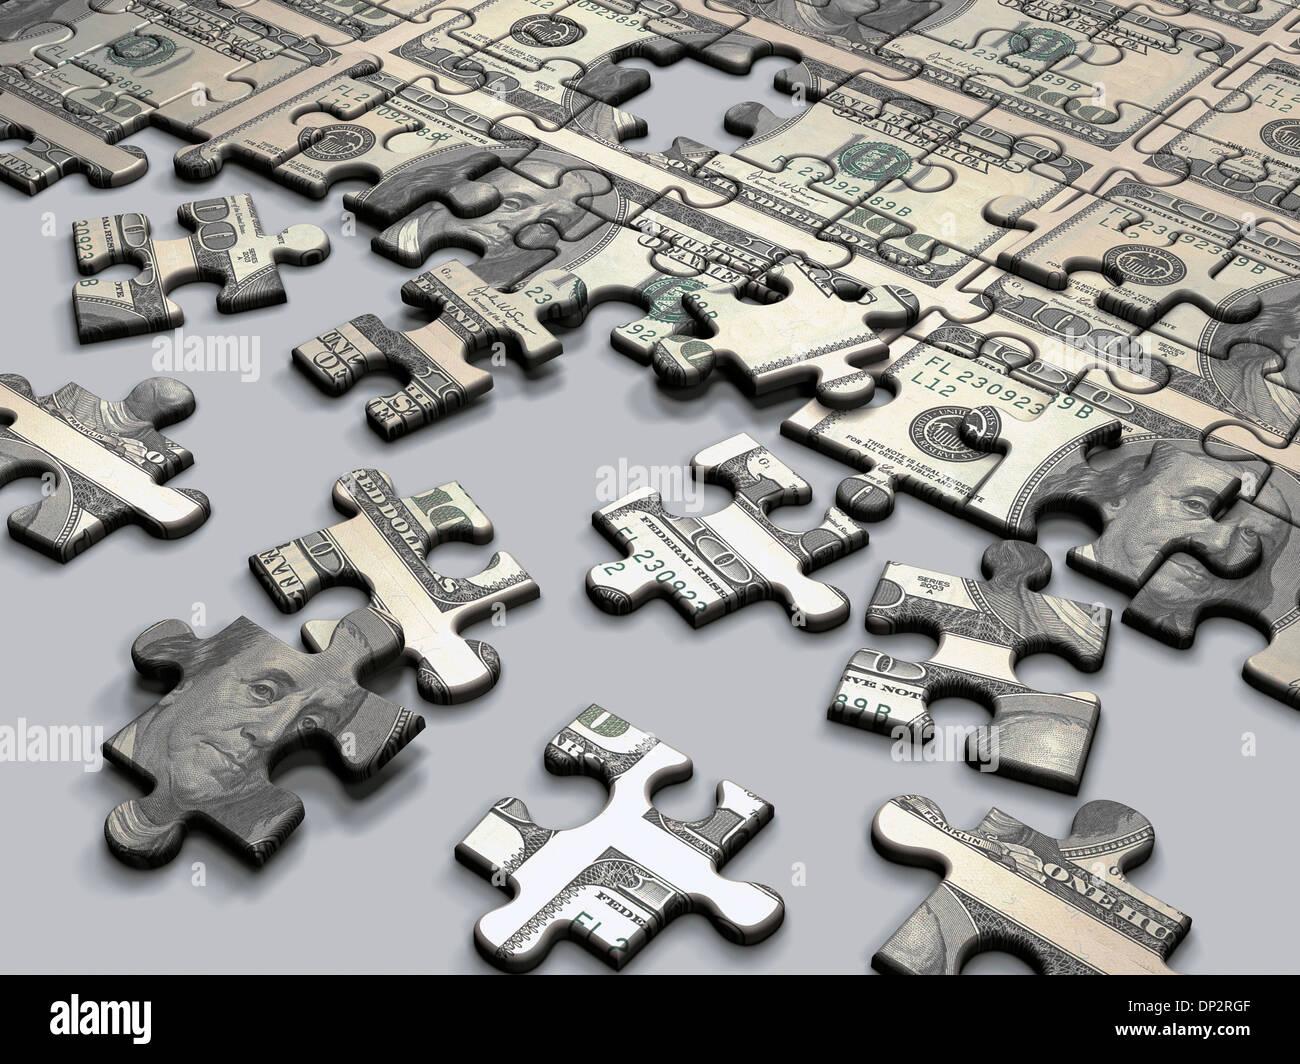 Jigsaw puzzle, artwork - Stock Image